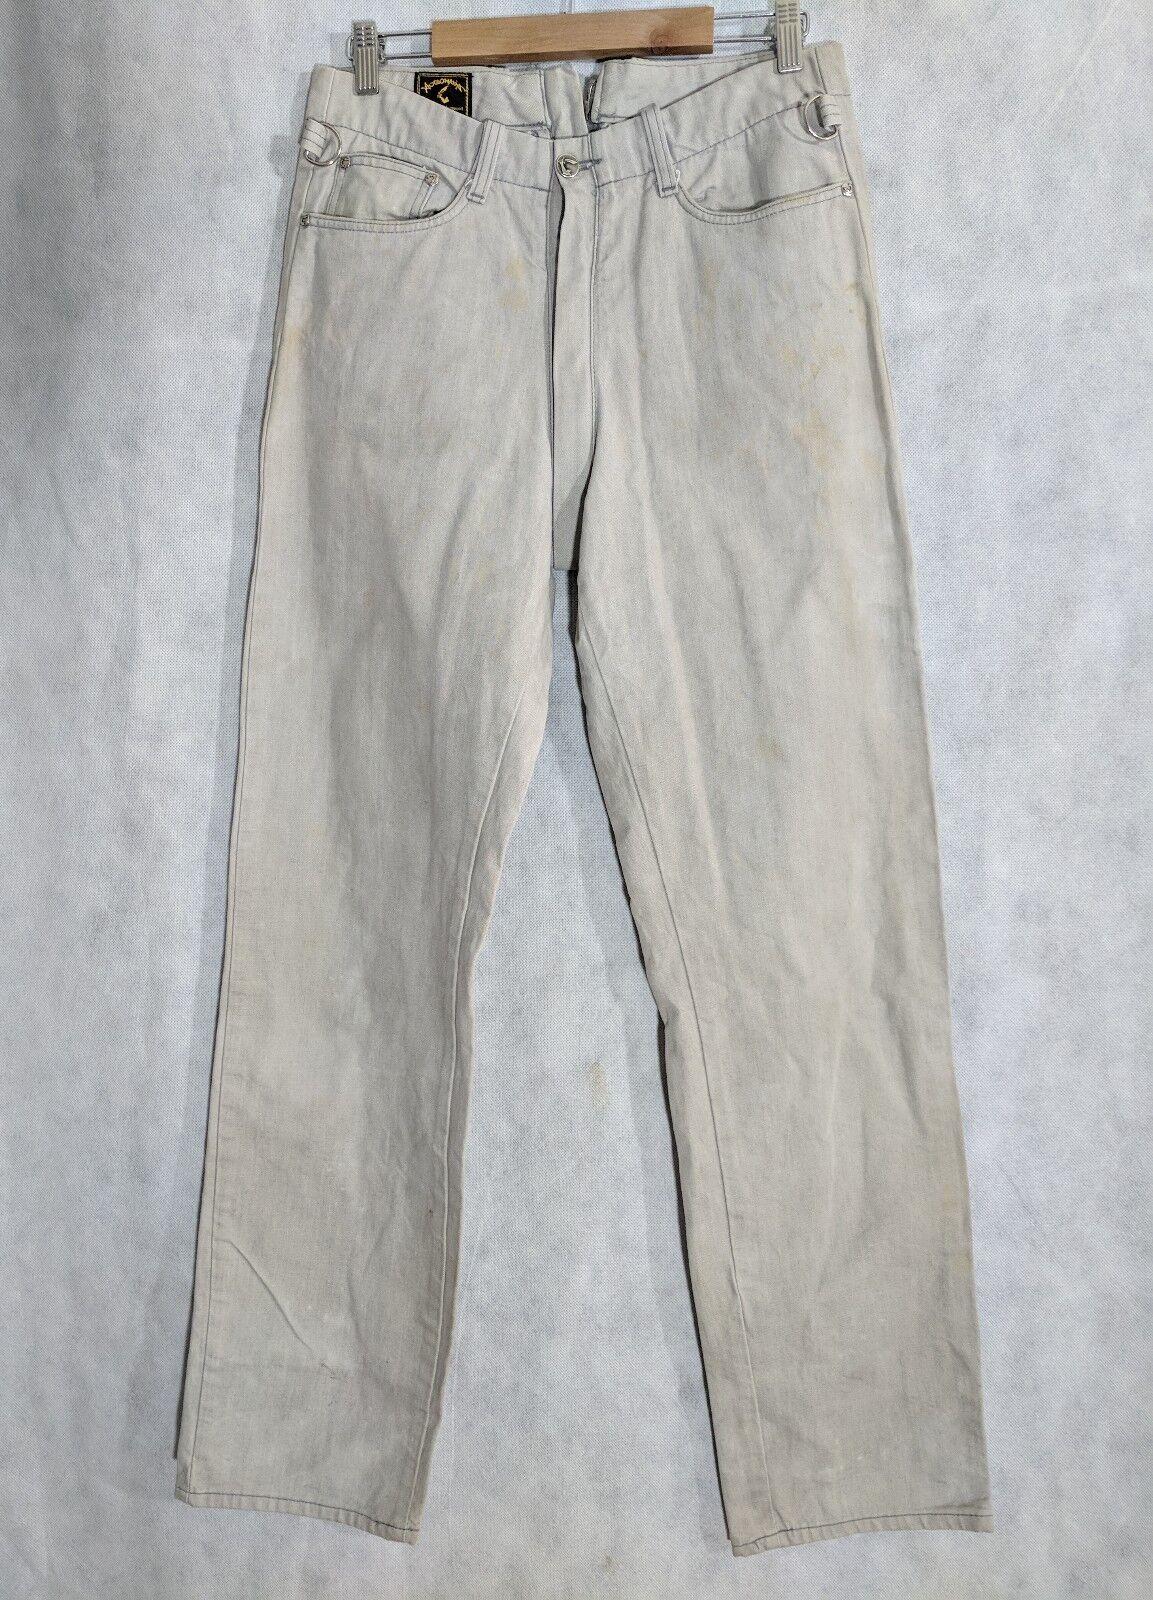 Vivienne Westwood MAN Anglomania Archive Vintage … - image 1